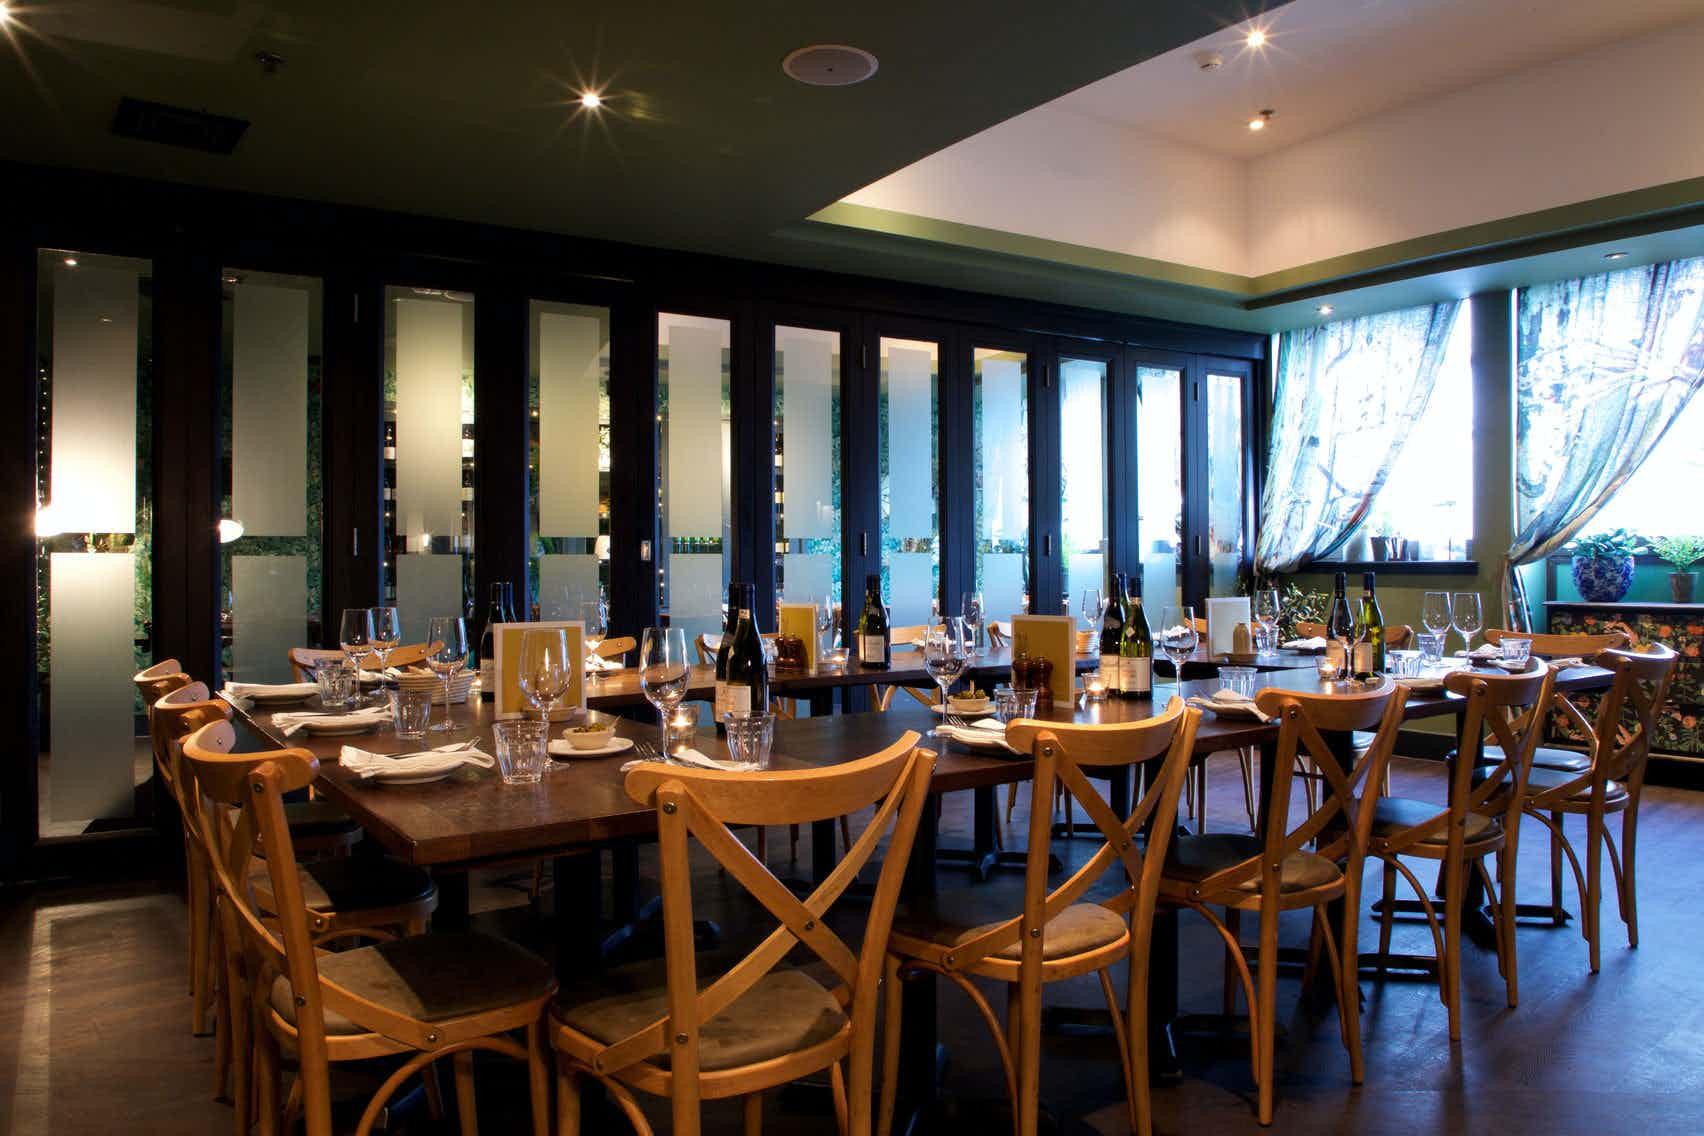 Medium private room, Brasserie Blanc, Southbank